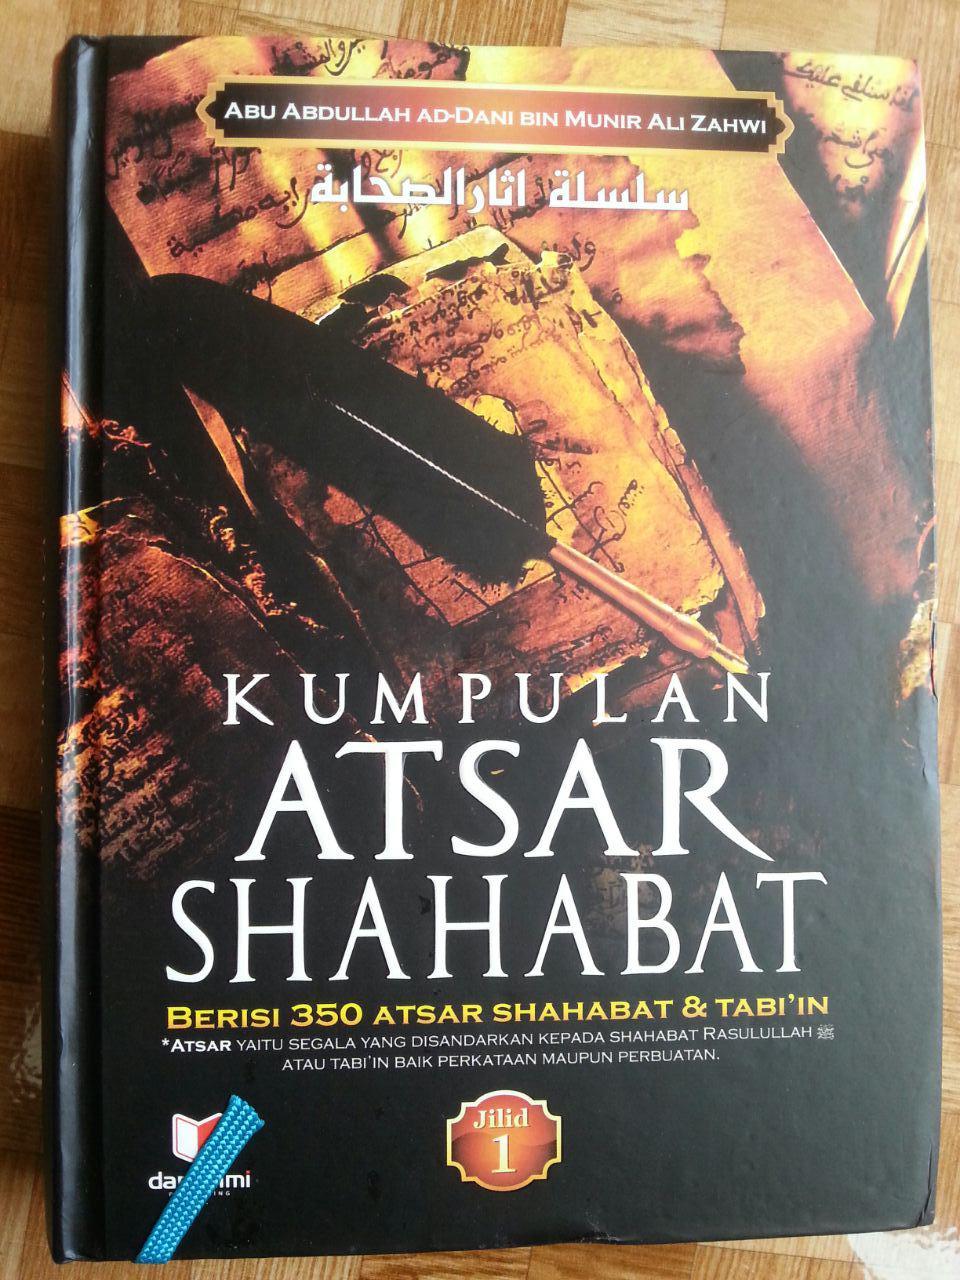 Buku Kumpulan Atsar Shahabat 1 Set 2 Jilid cover 3